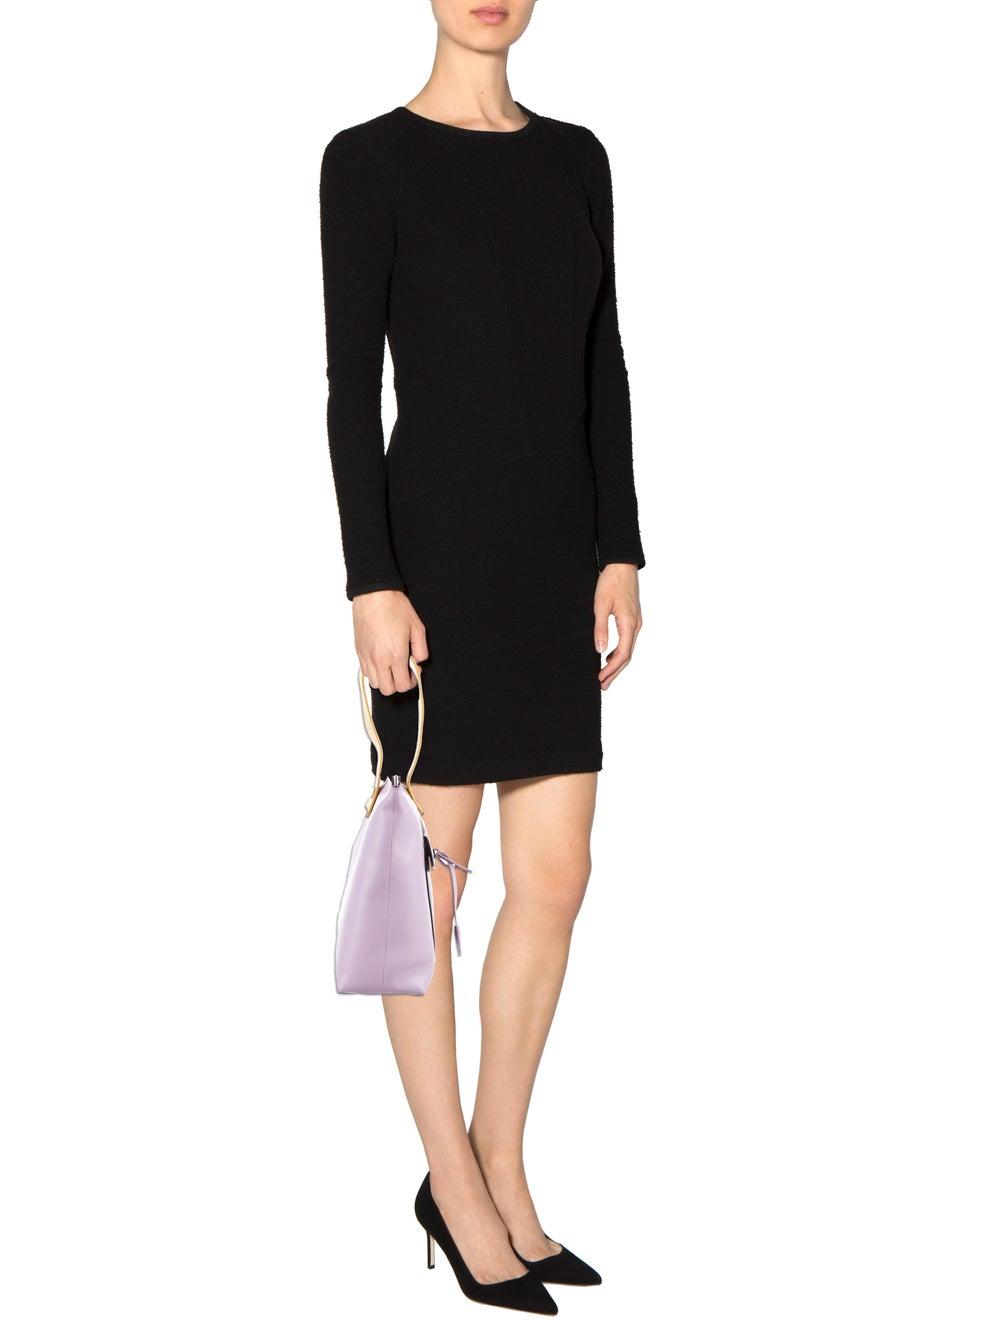 Christian Dior Pocket Tote black - image 2